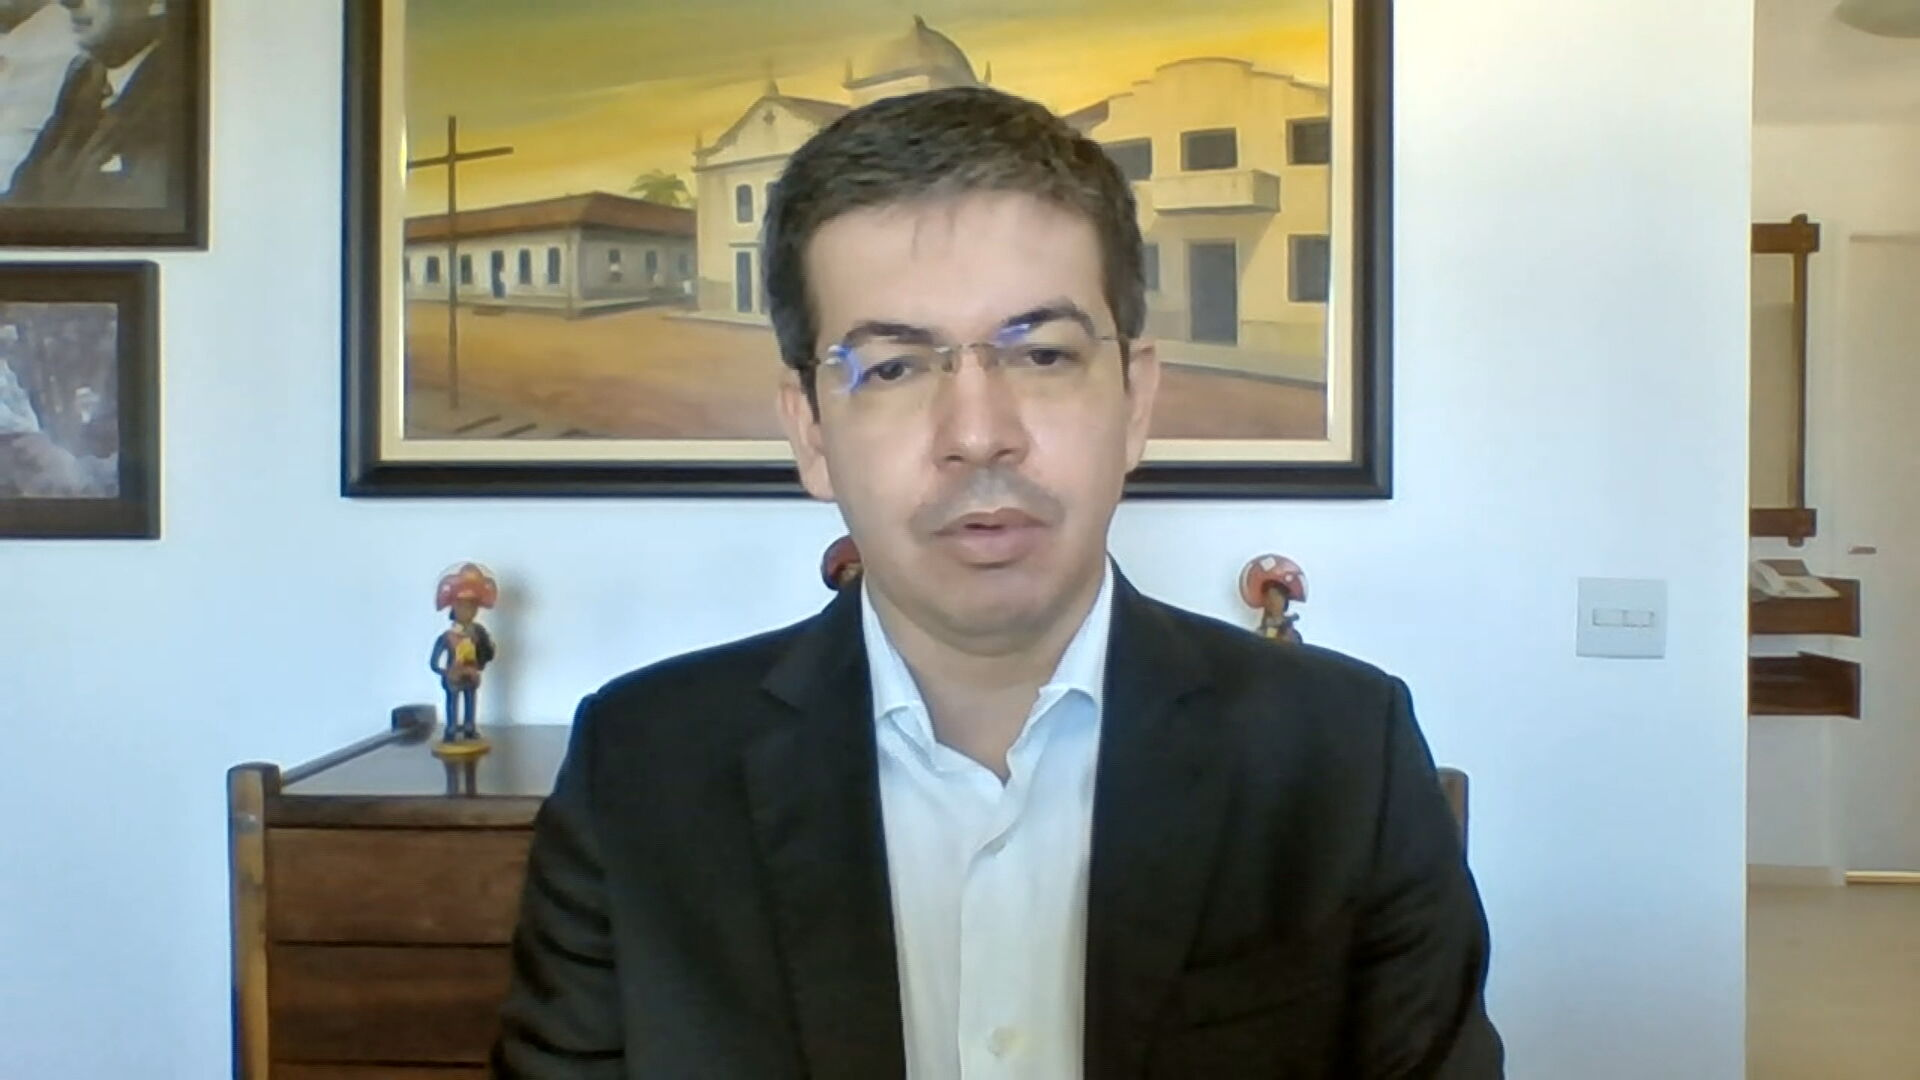 Senador Randolfe Rodrigues (Rede-AP), vice-presidente da CPI da Pandemia